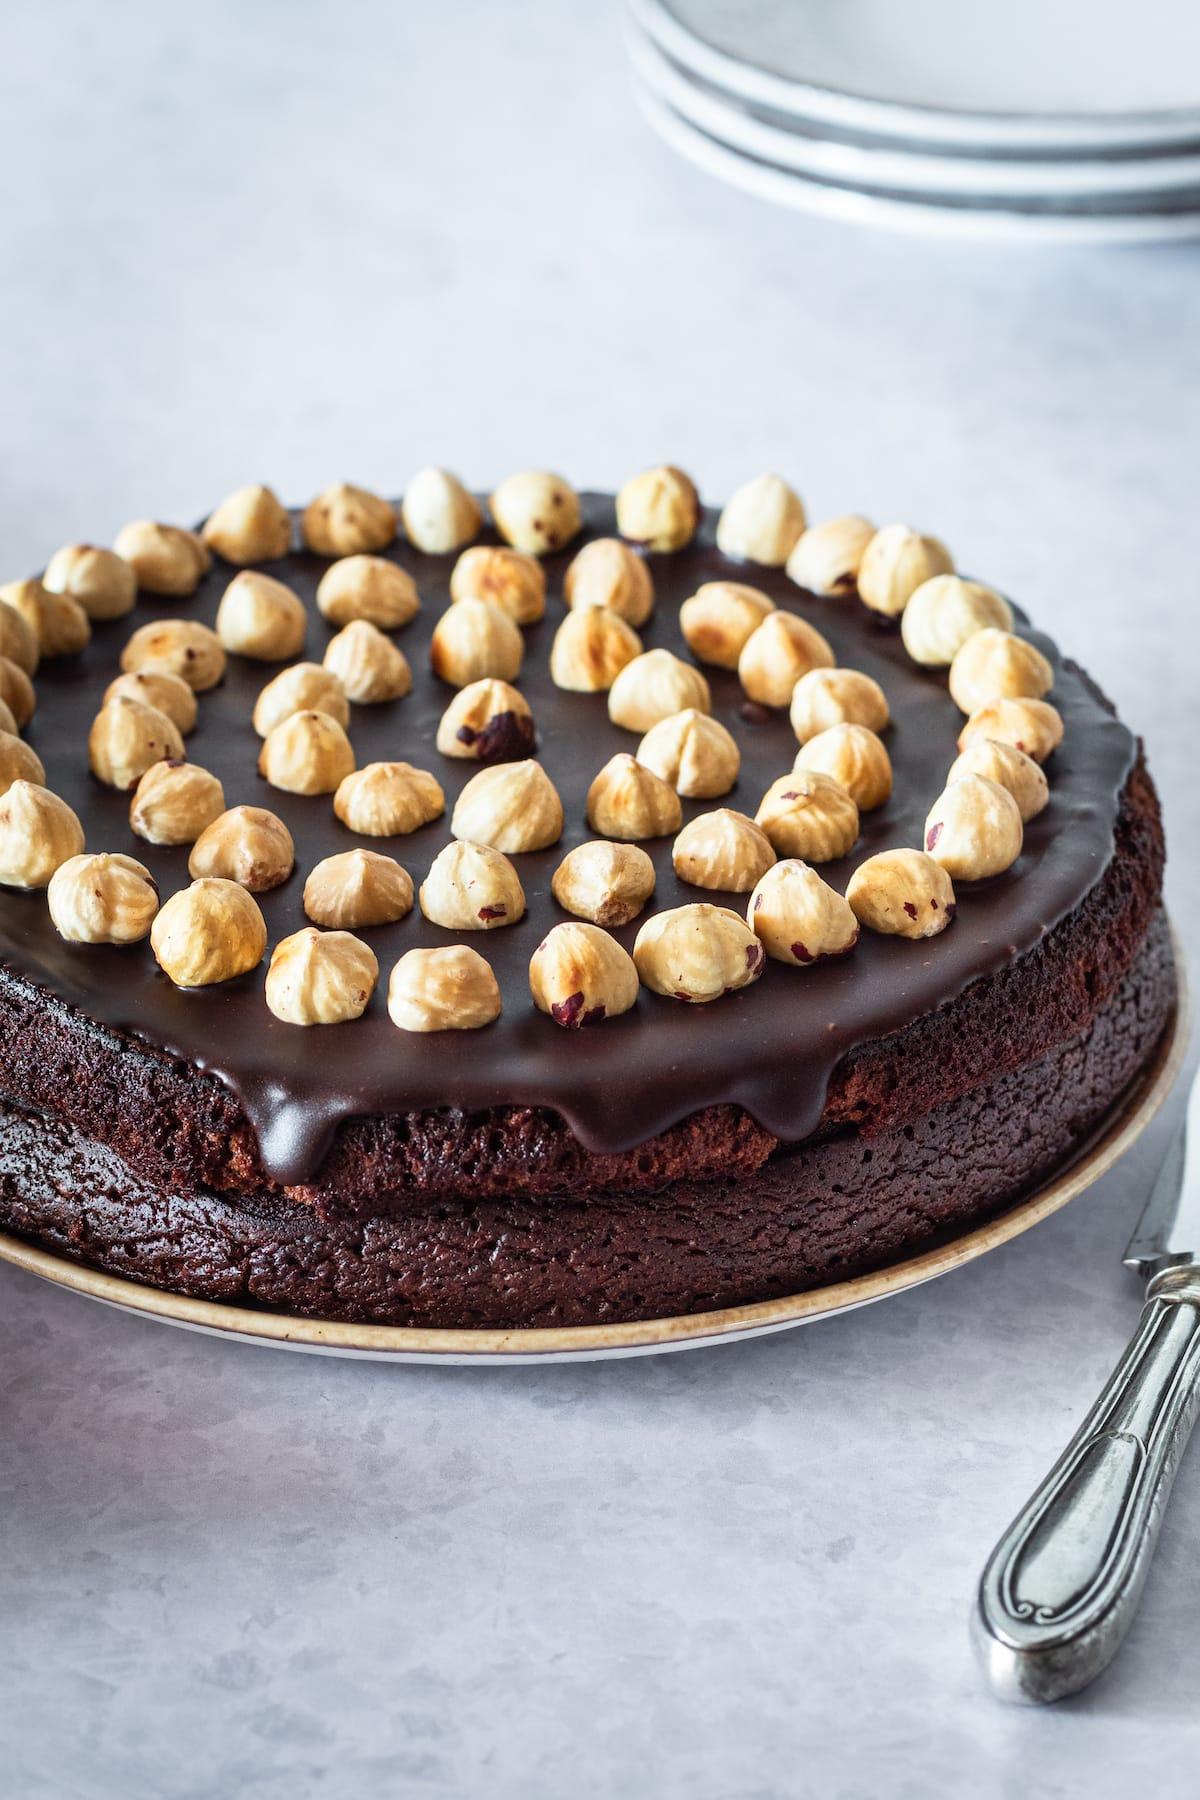 whole chocolate cake topped with toasted hazelnuts